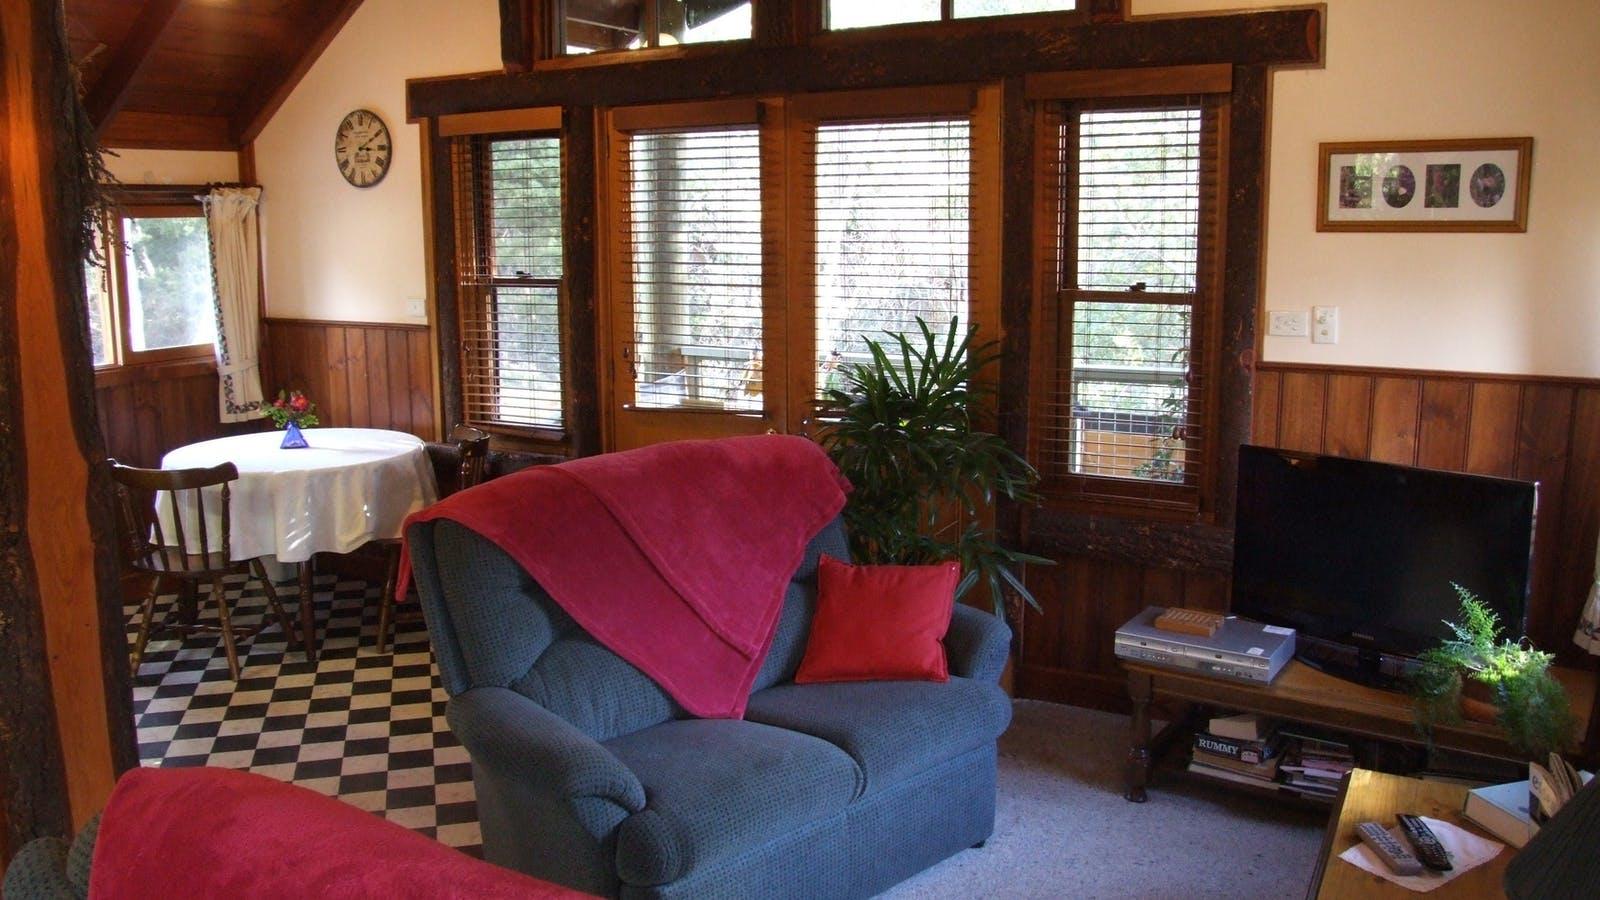 Lavender Hue B&B accommodation, Harrietville, North East Victoria, Great Alpine Valleys